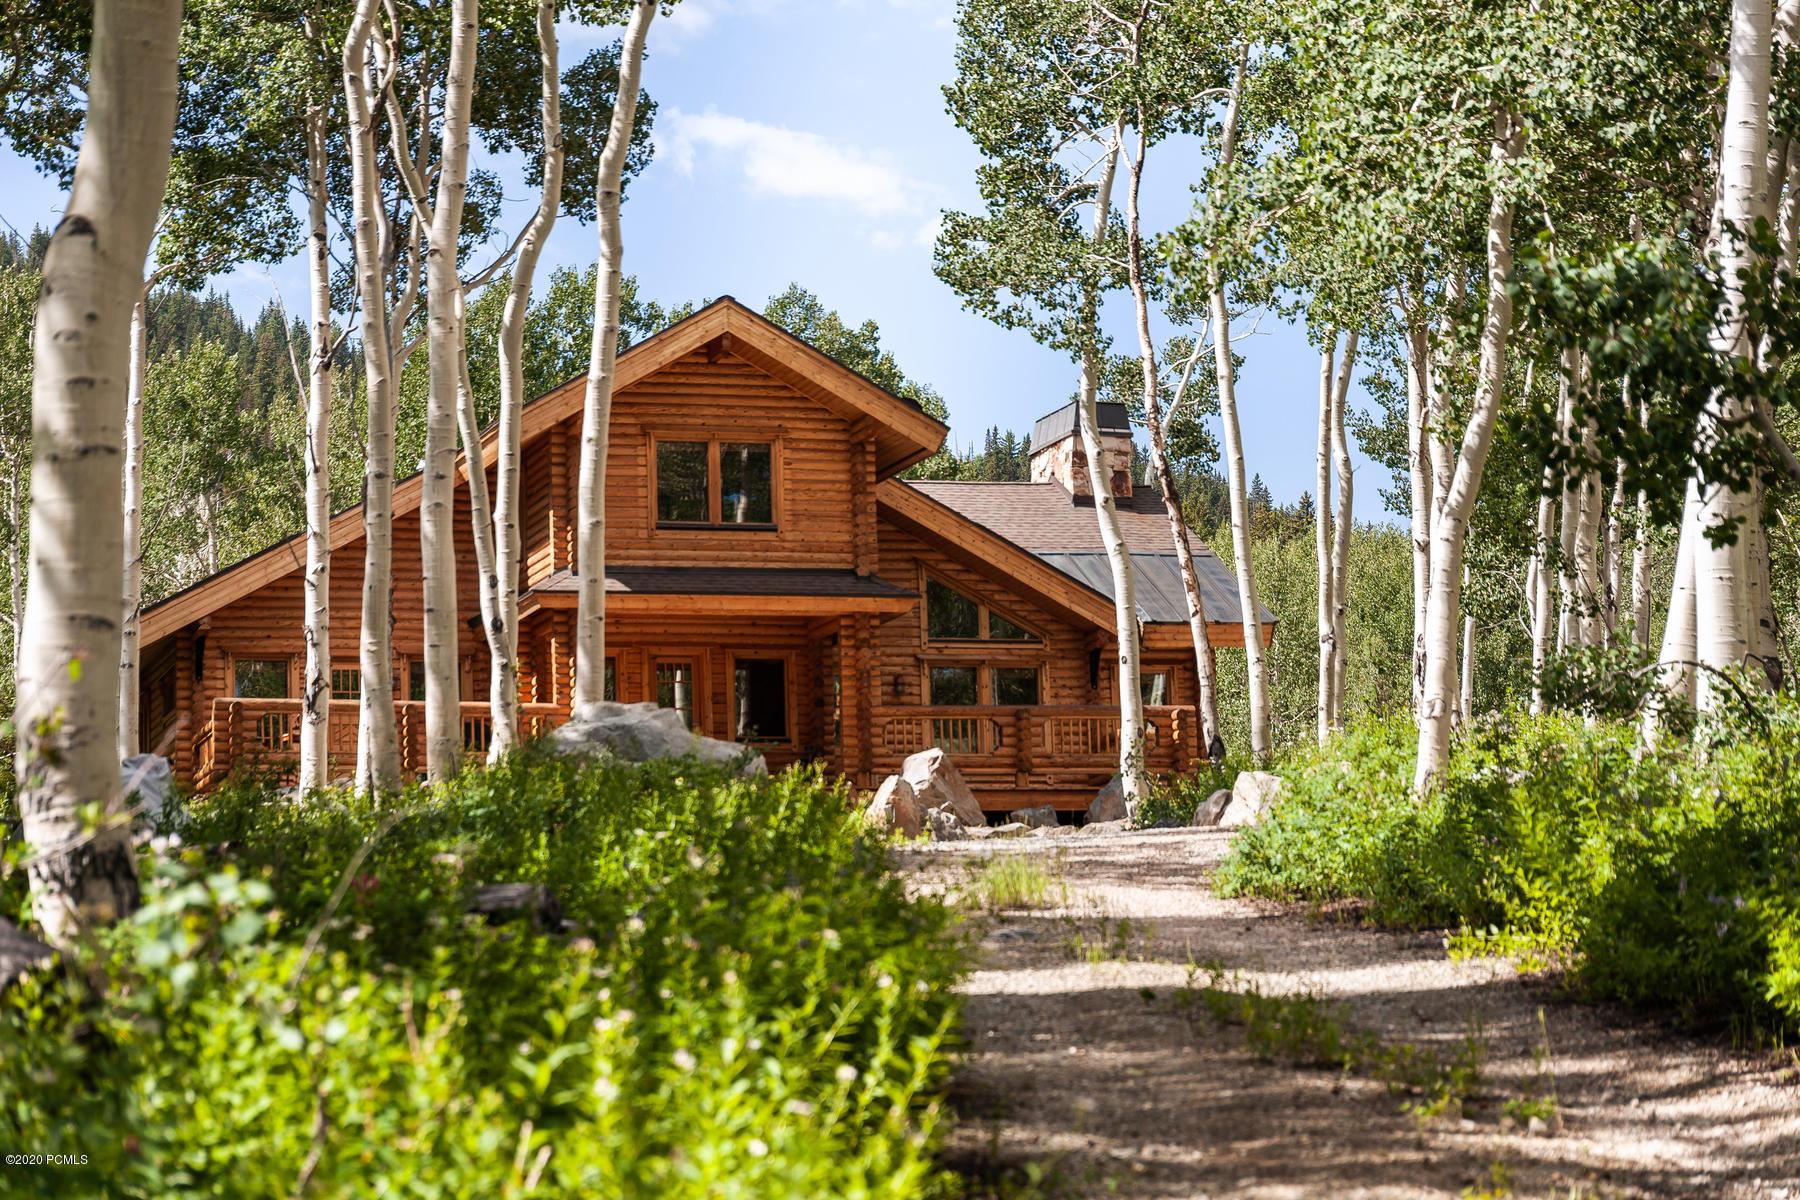 2524 Mars Way, Midway, Utah 84049, 3 Bedrooms Bedrooms, ,3 BathroomsBathrooms,Single Family,For Sale,Mars Way,20190109112430415765000000